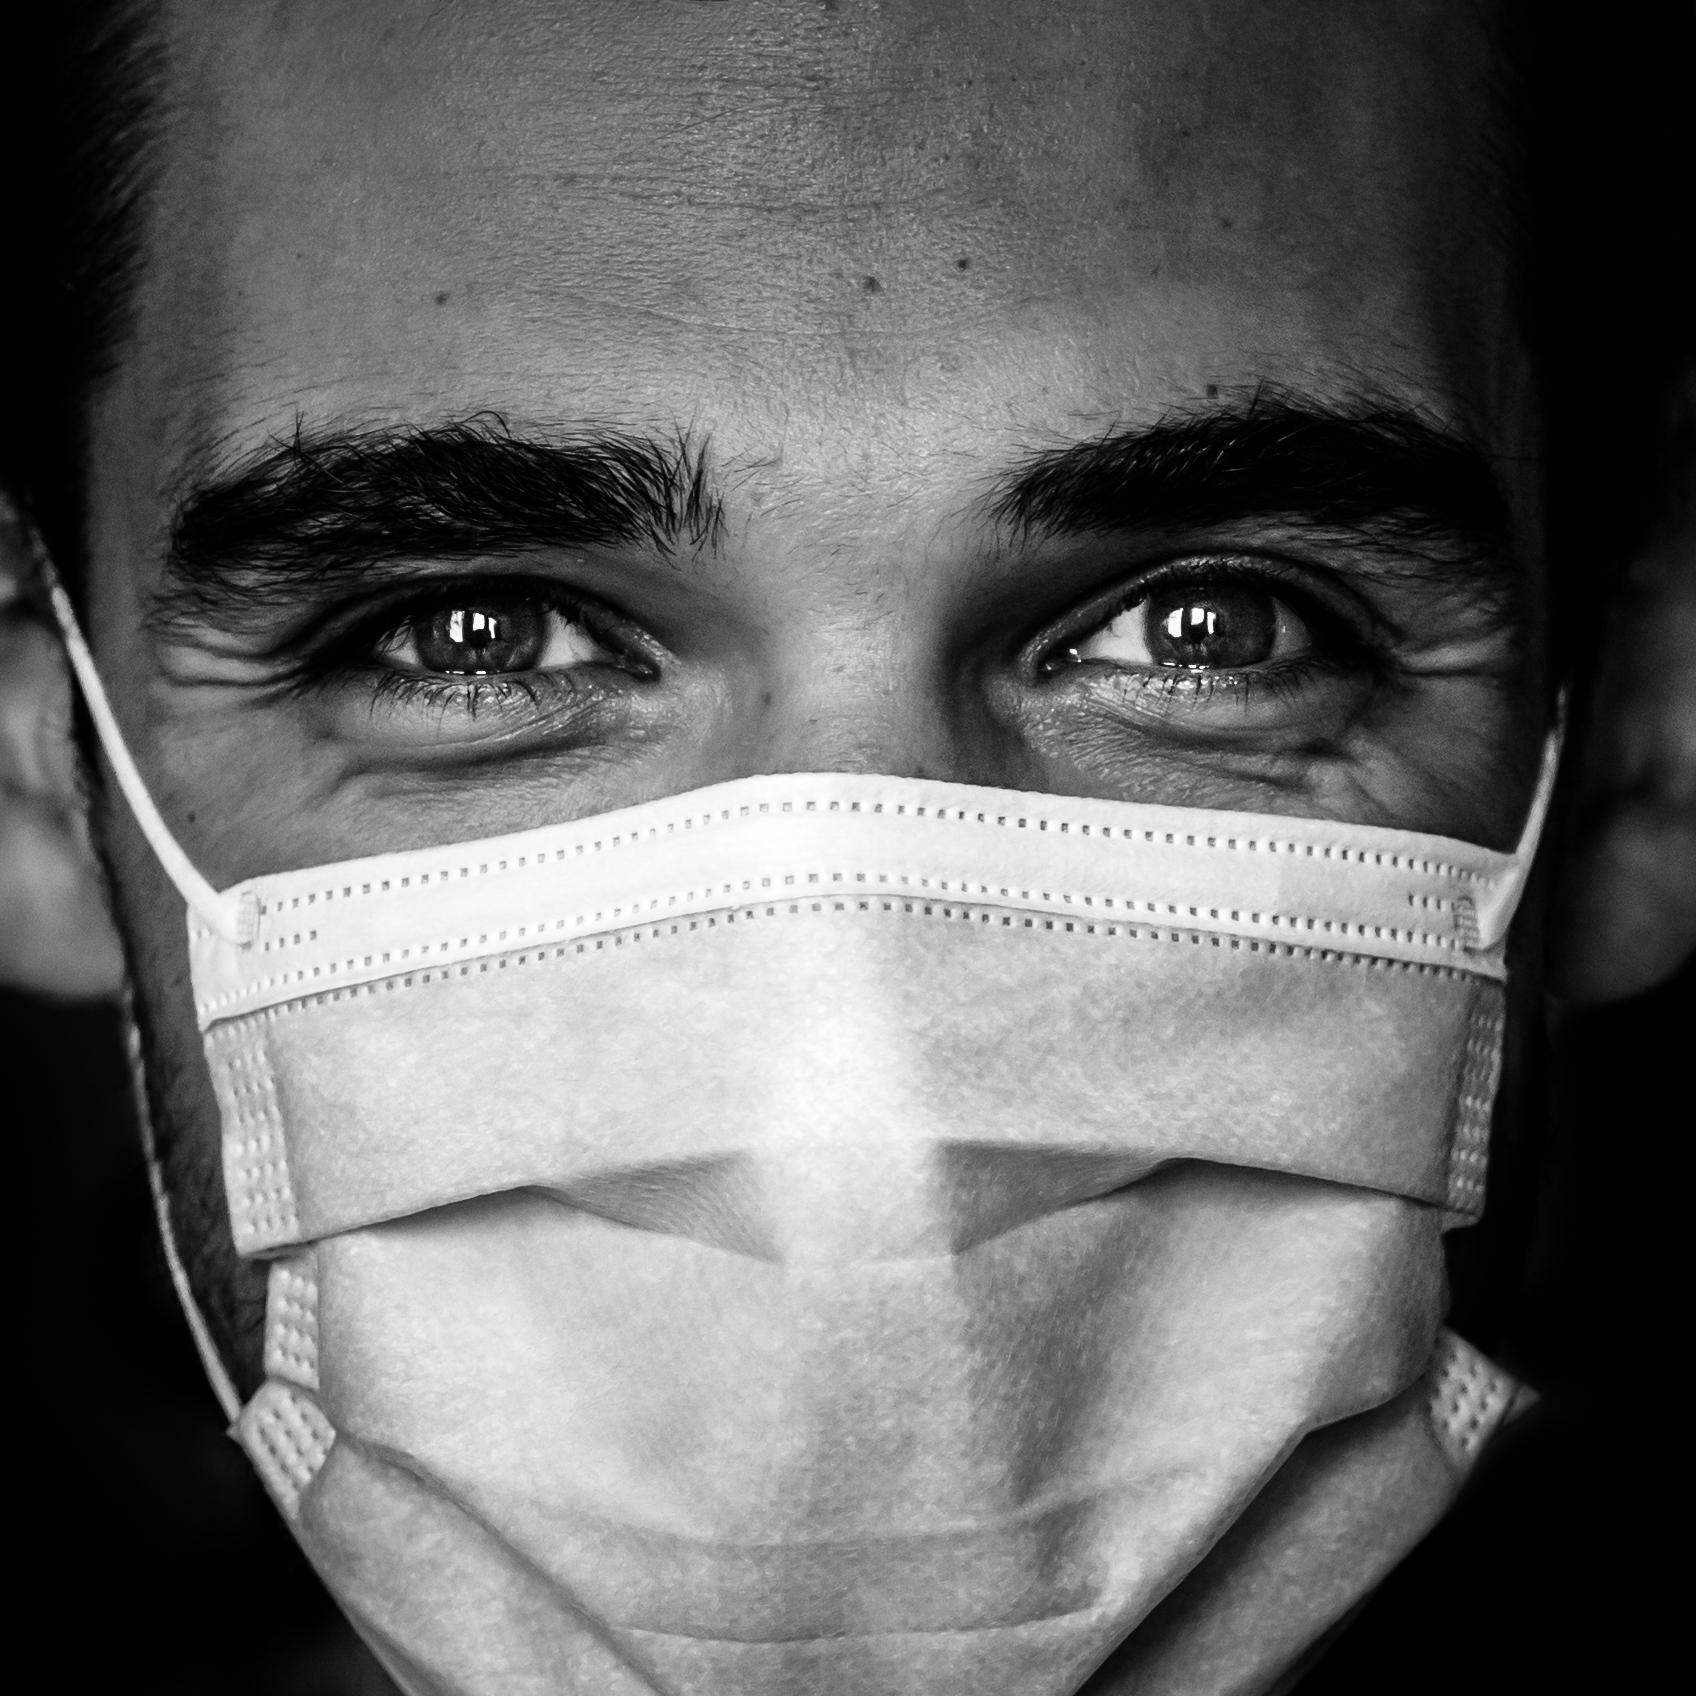 Andrei Talapanescu – Mask Portrait Series (Ashkan Mortezapour Photography) (1 of 1)